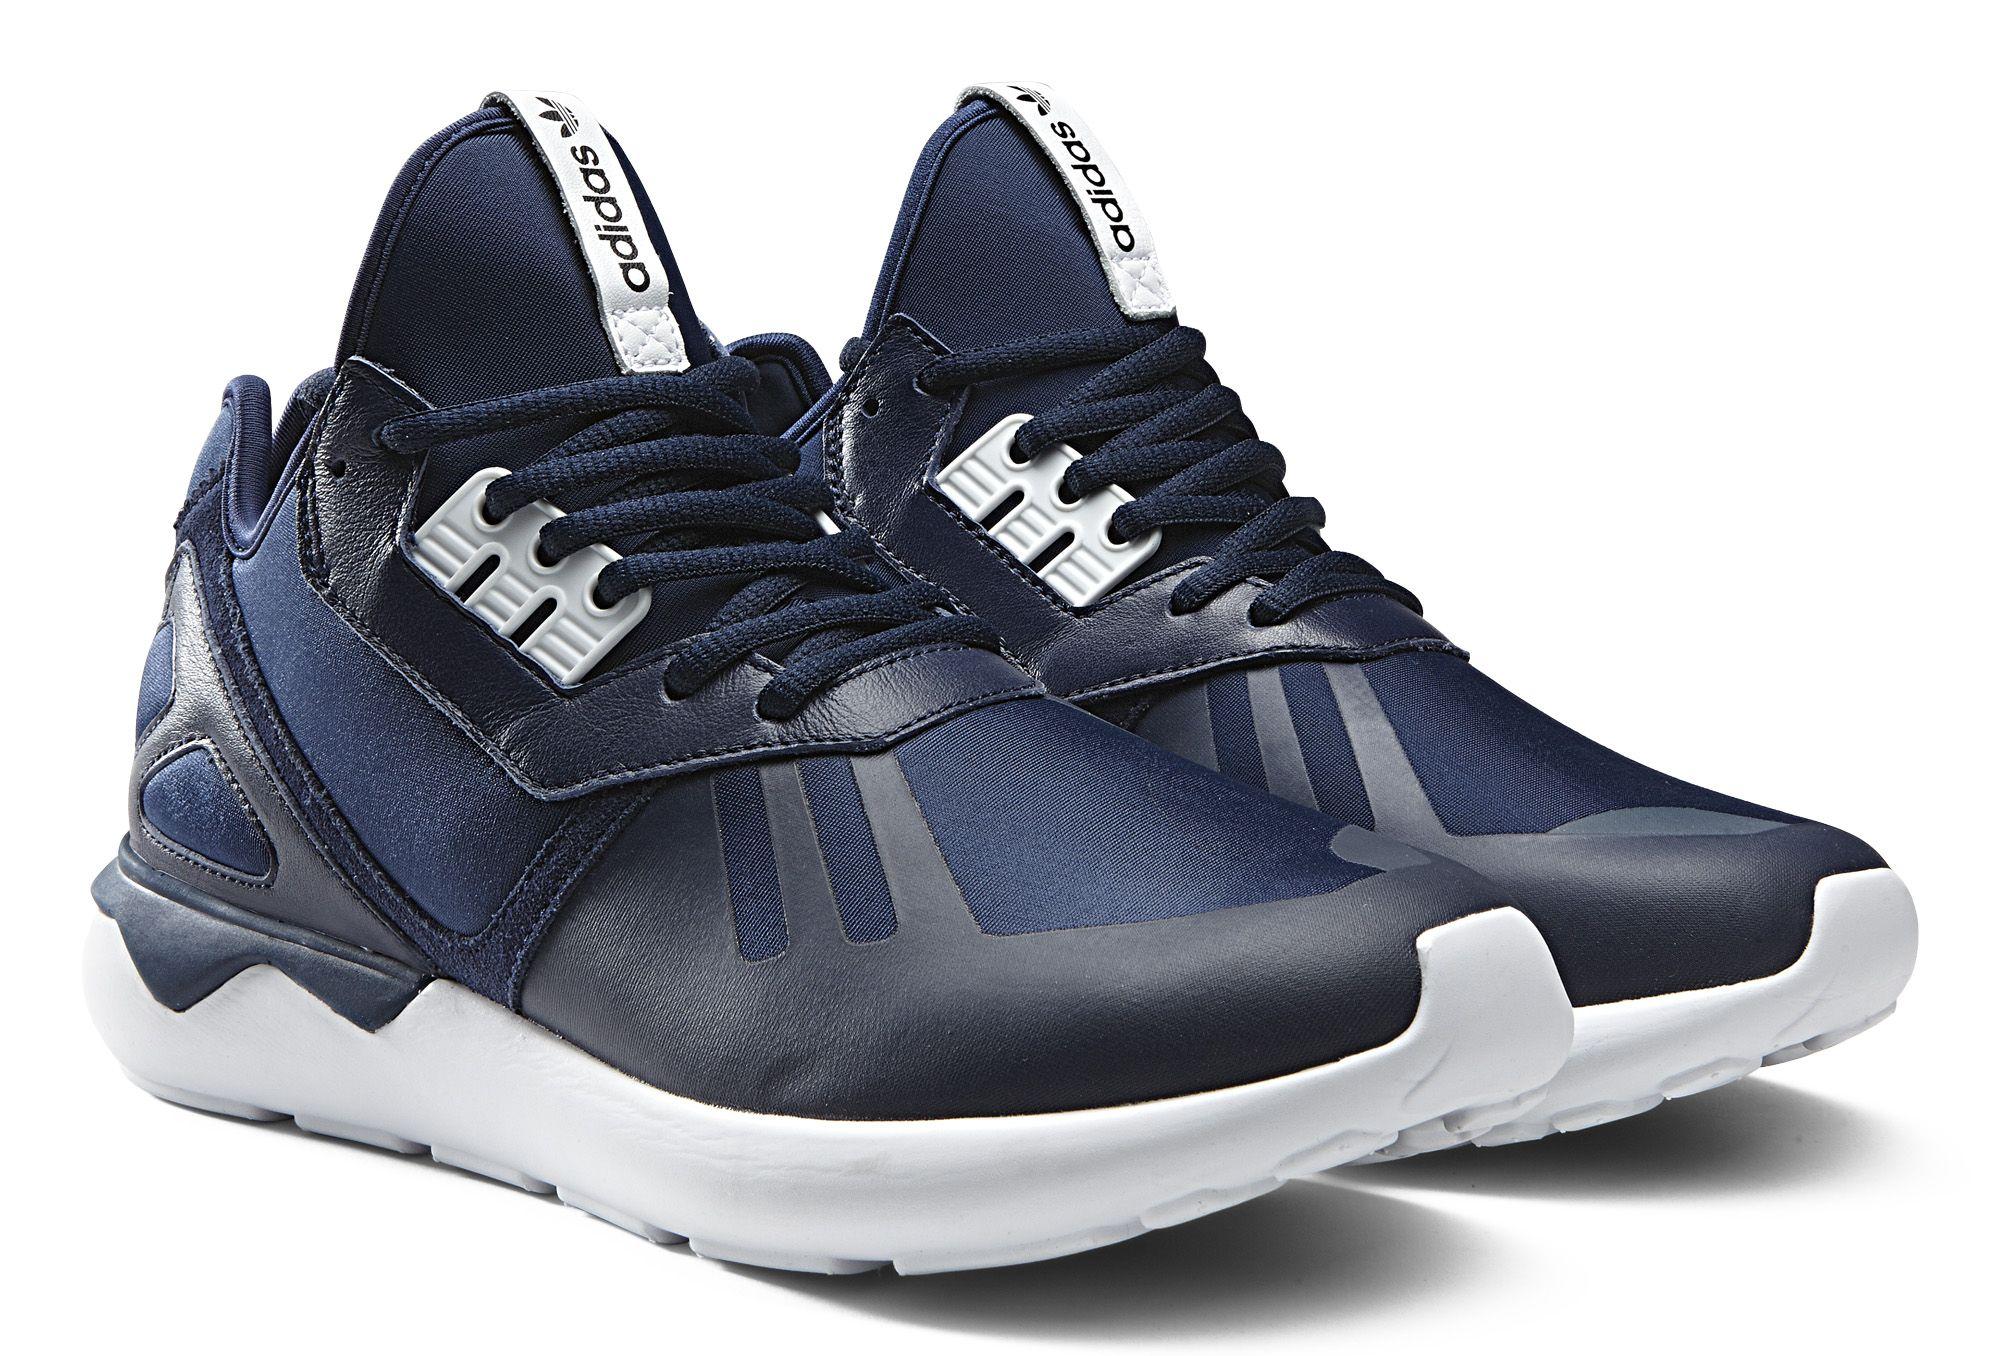 Adidas Chaussures Maroc